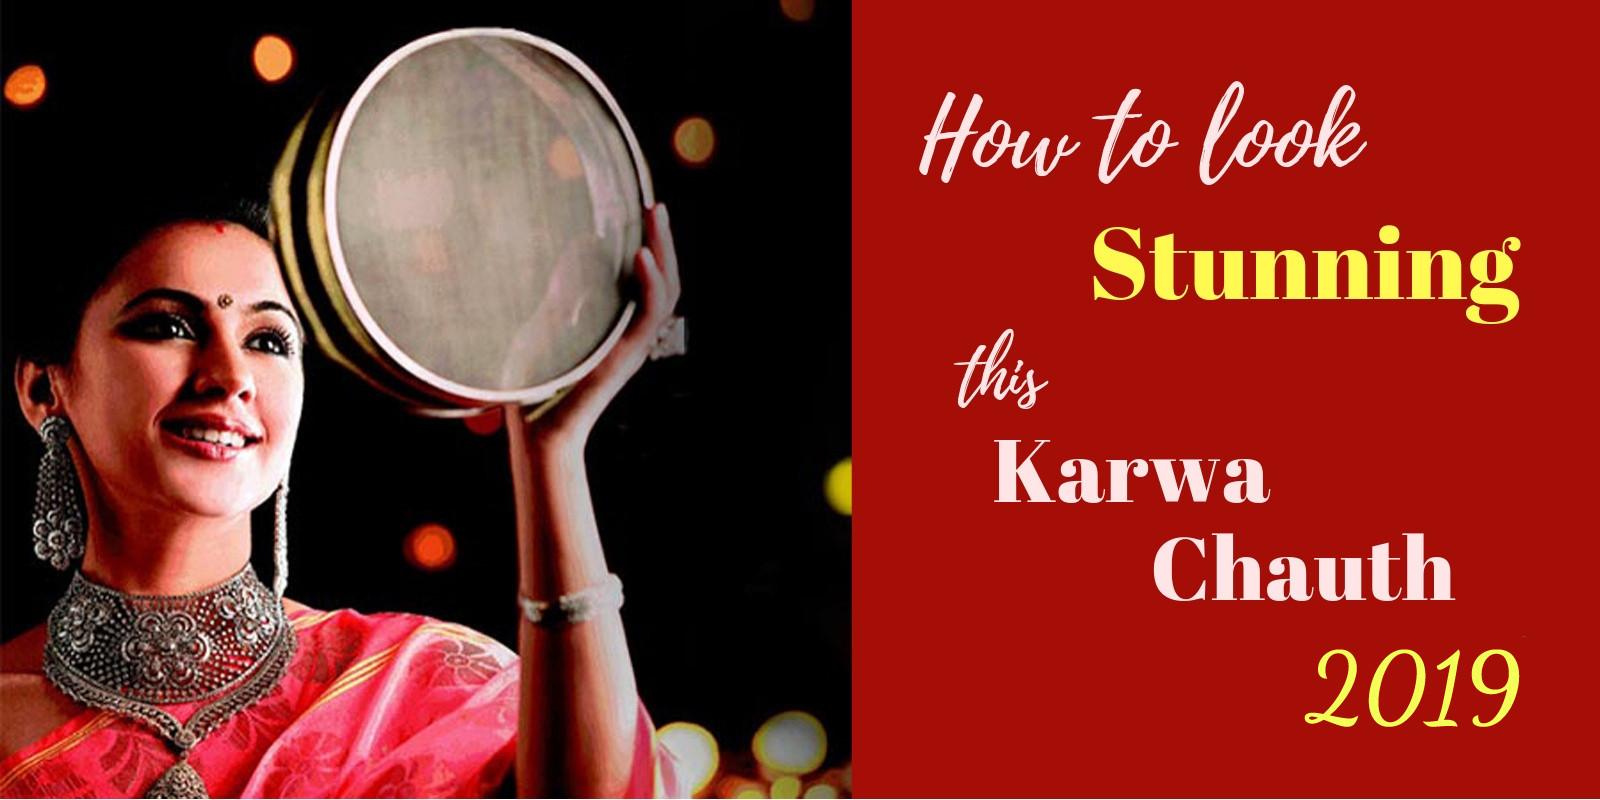 How to look stunning this Karwa Chauth 2019